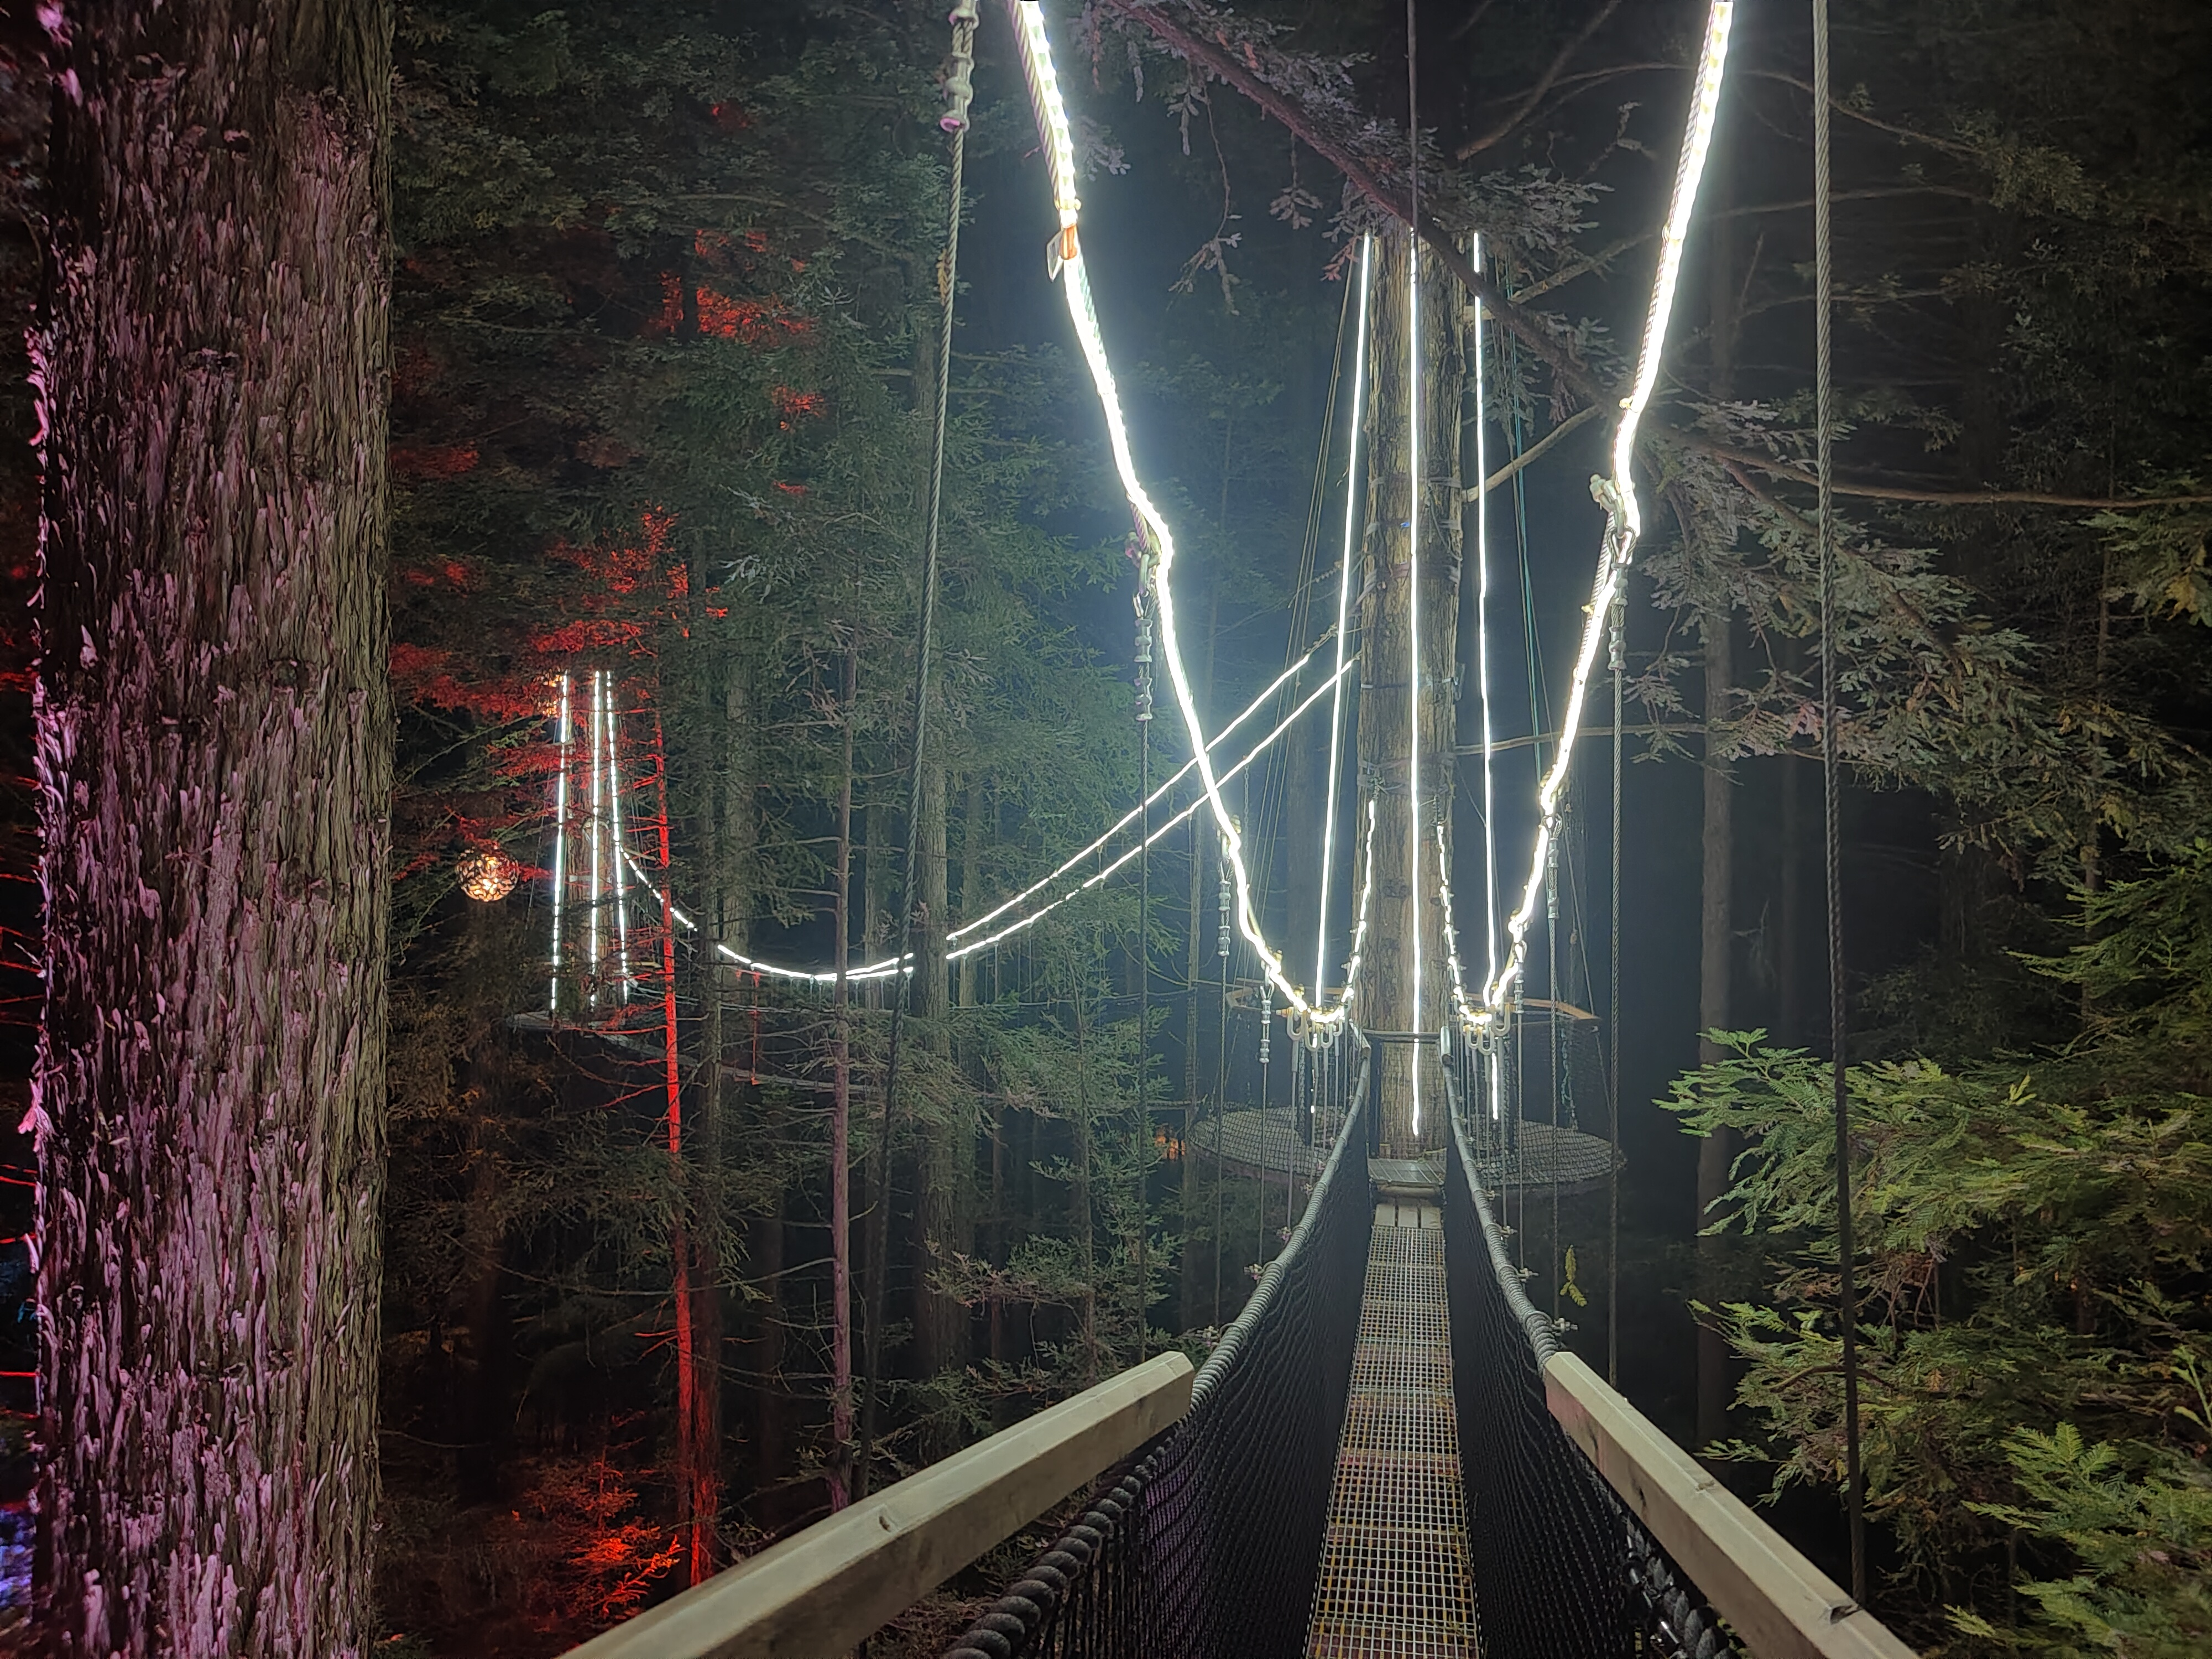 A bridge on the Rotorua Redwoods Treewalk at night